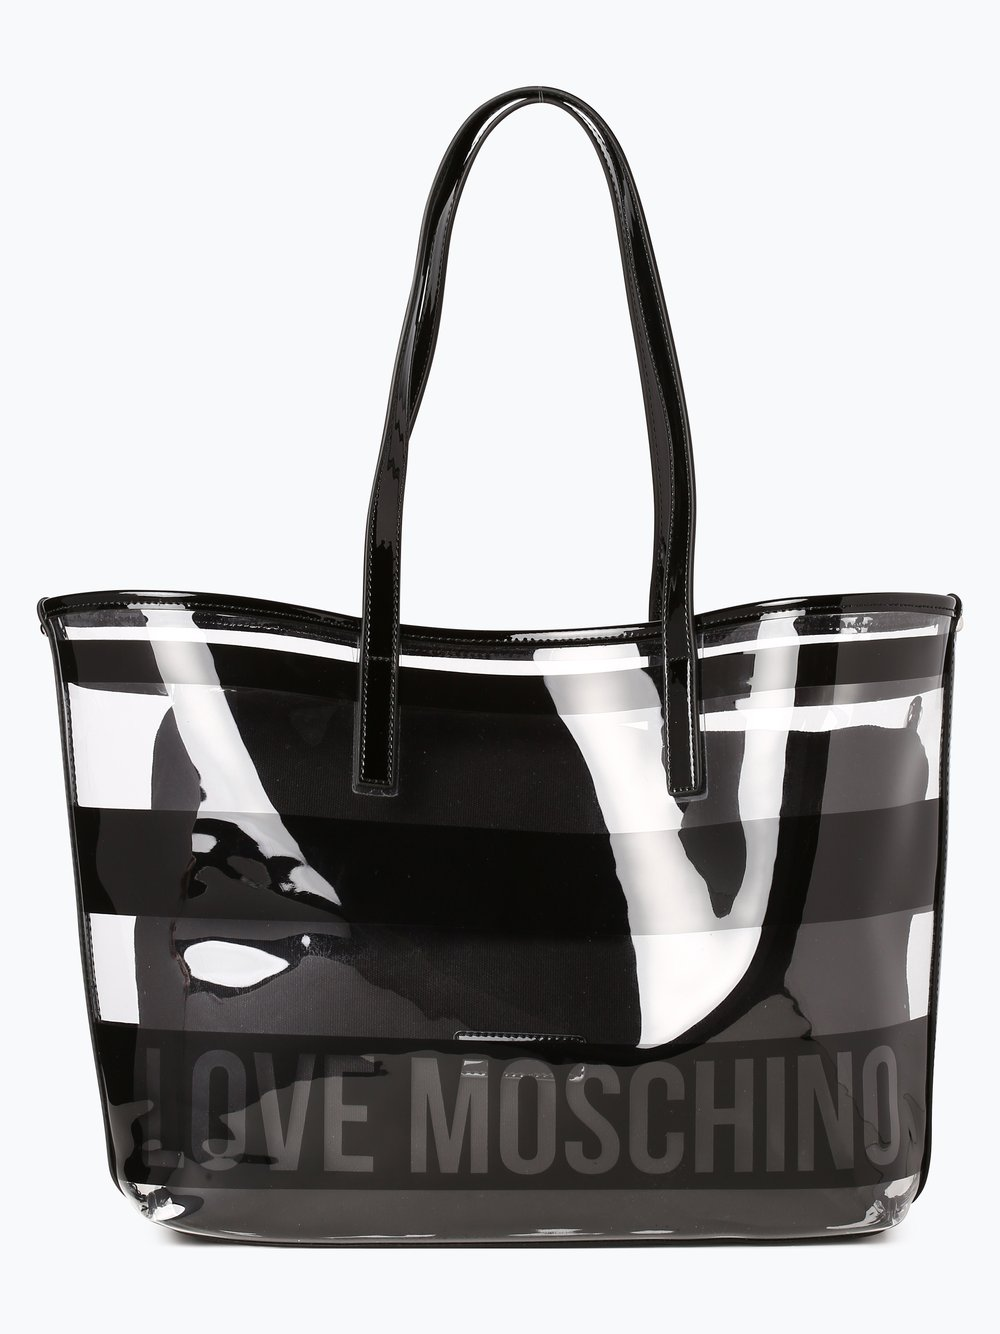 aaa11a6bee250 Love Moschino Damska torba shopper kup online | VANGRAAF.COM